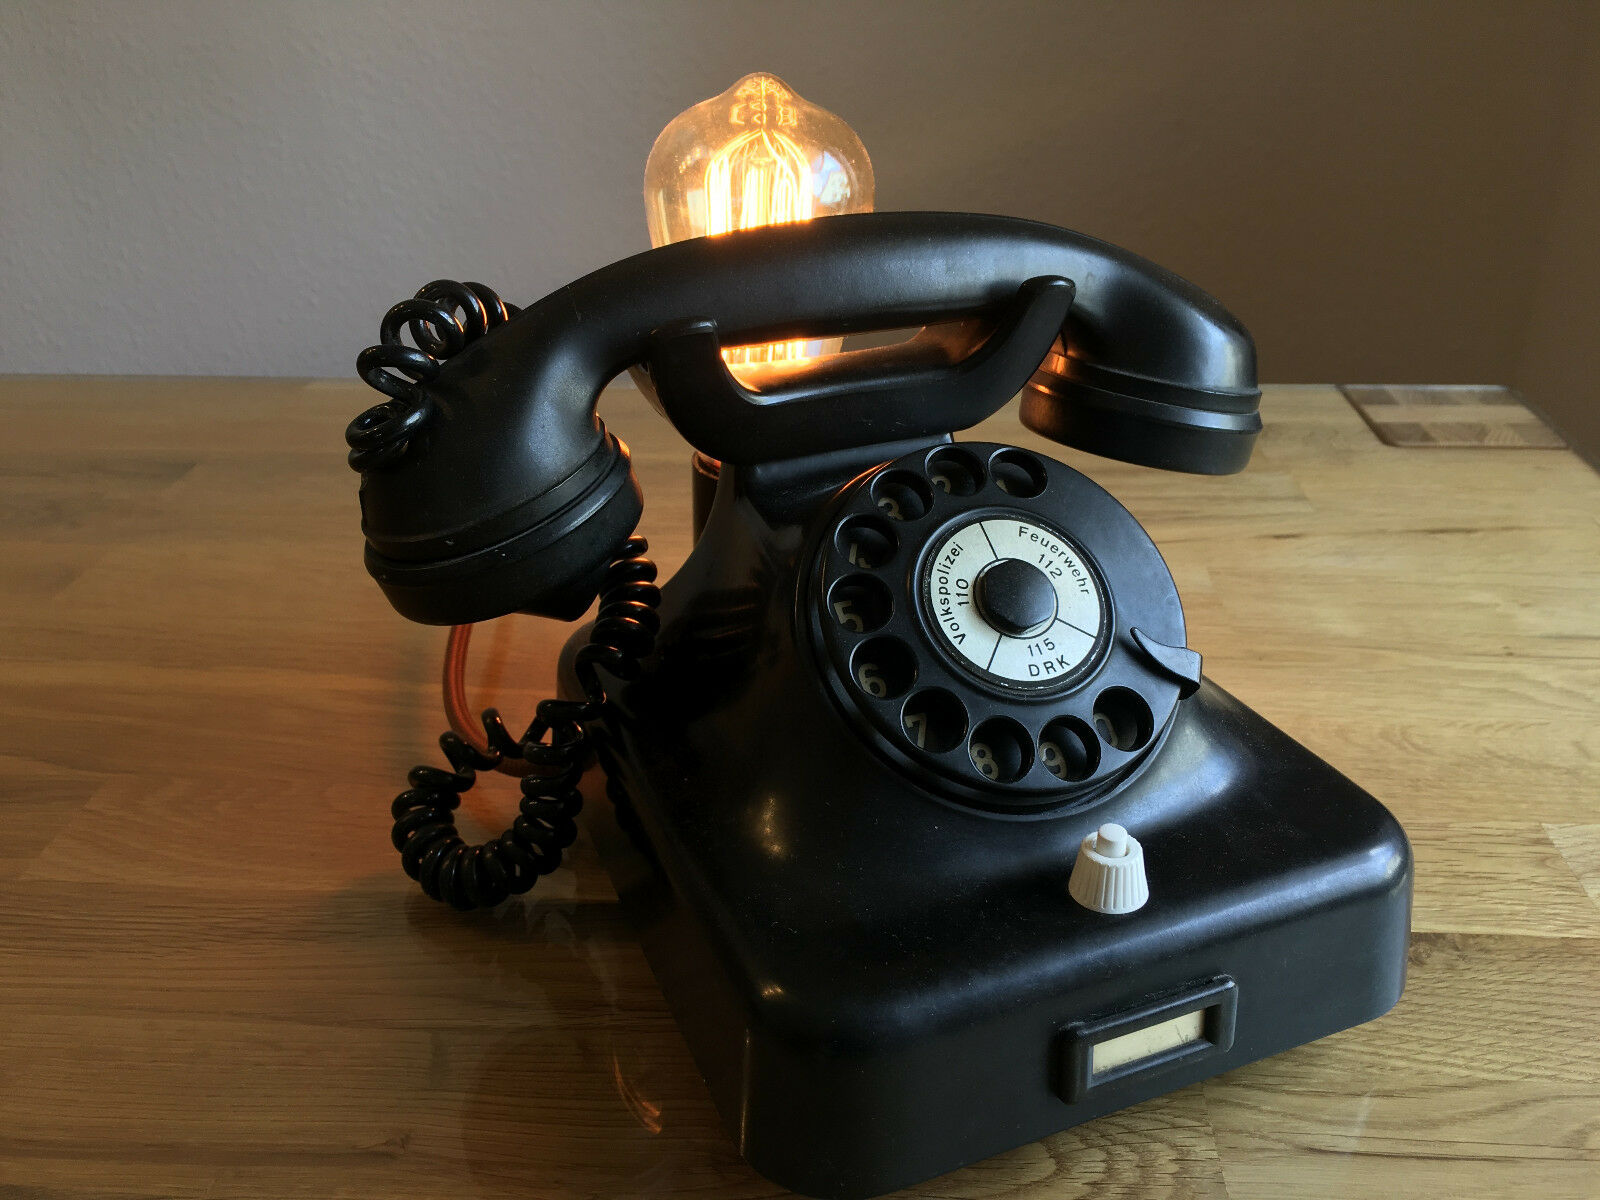 EINMALIG Edison Bulb Lamp Vintage steam punk, Telefon, Retro Leuchte Lampe